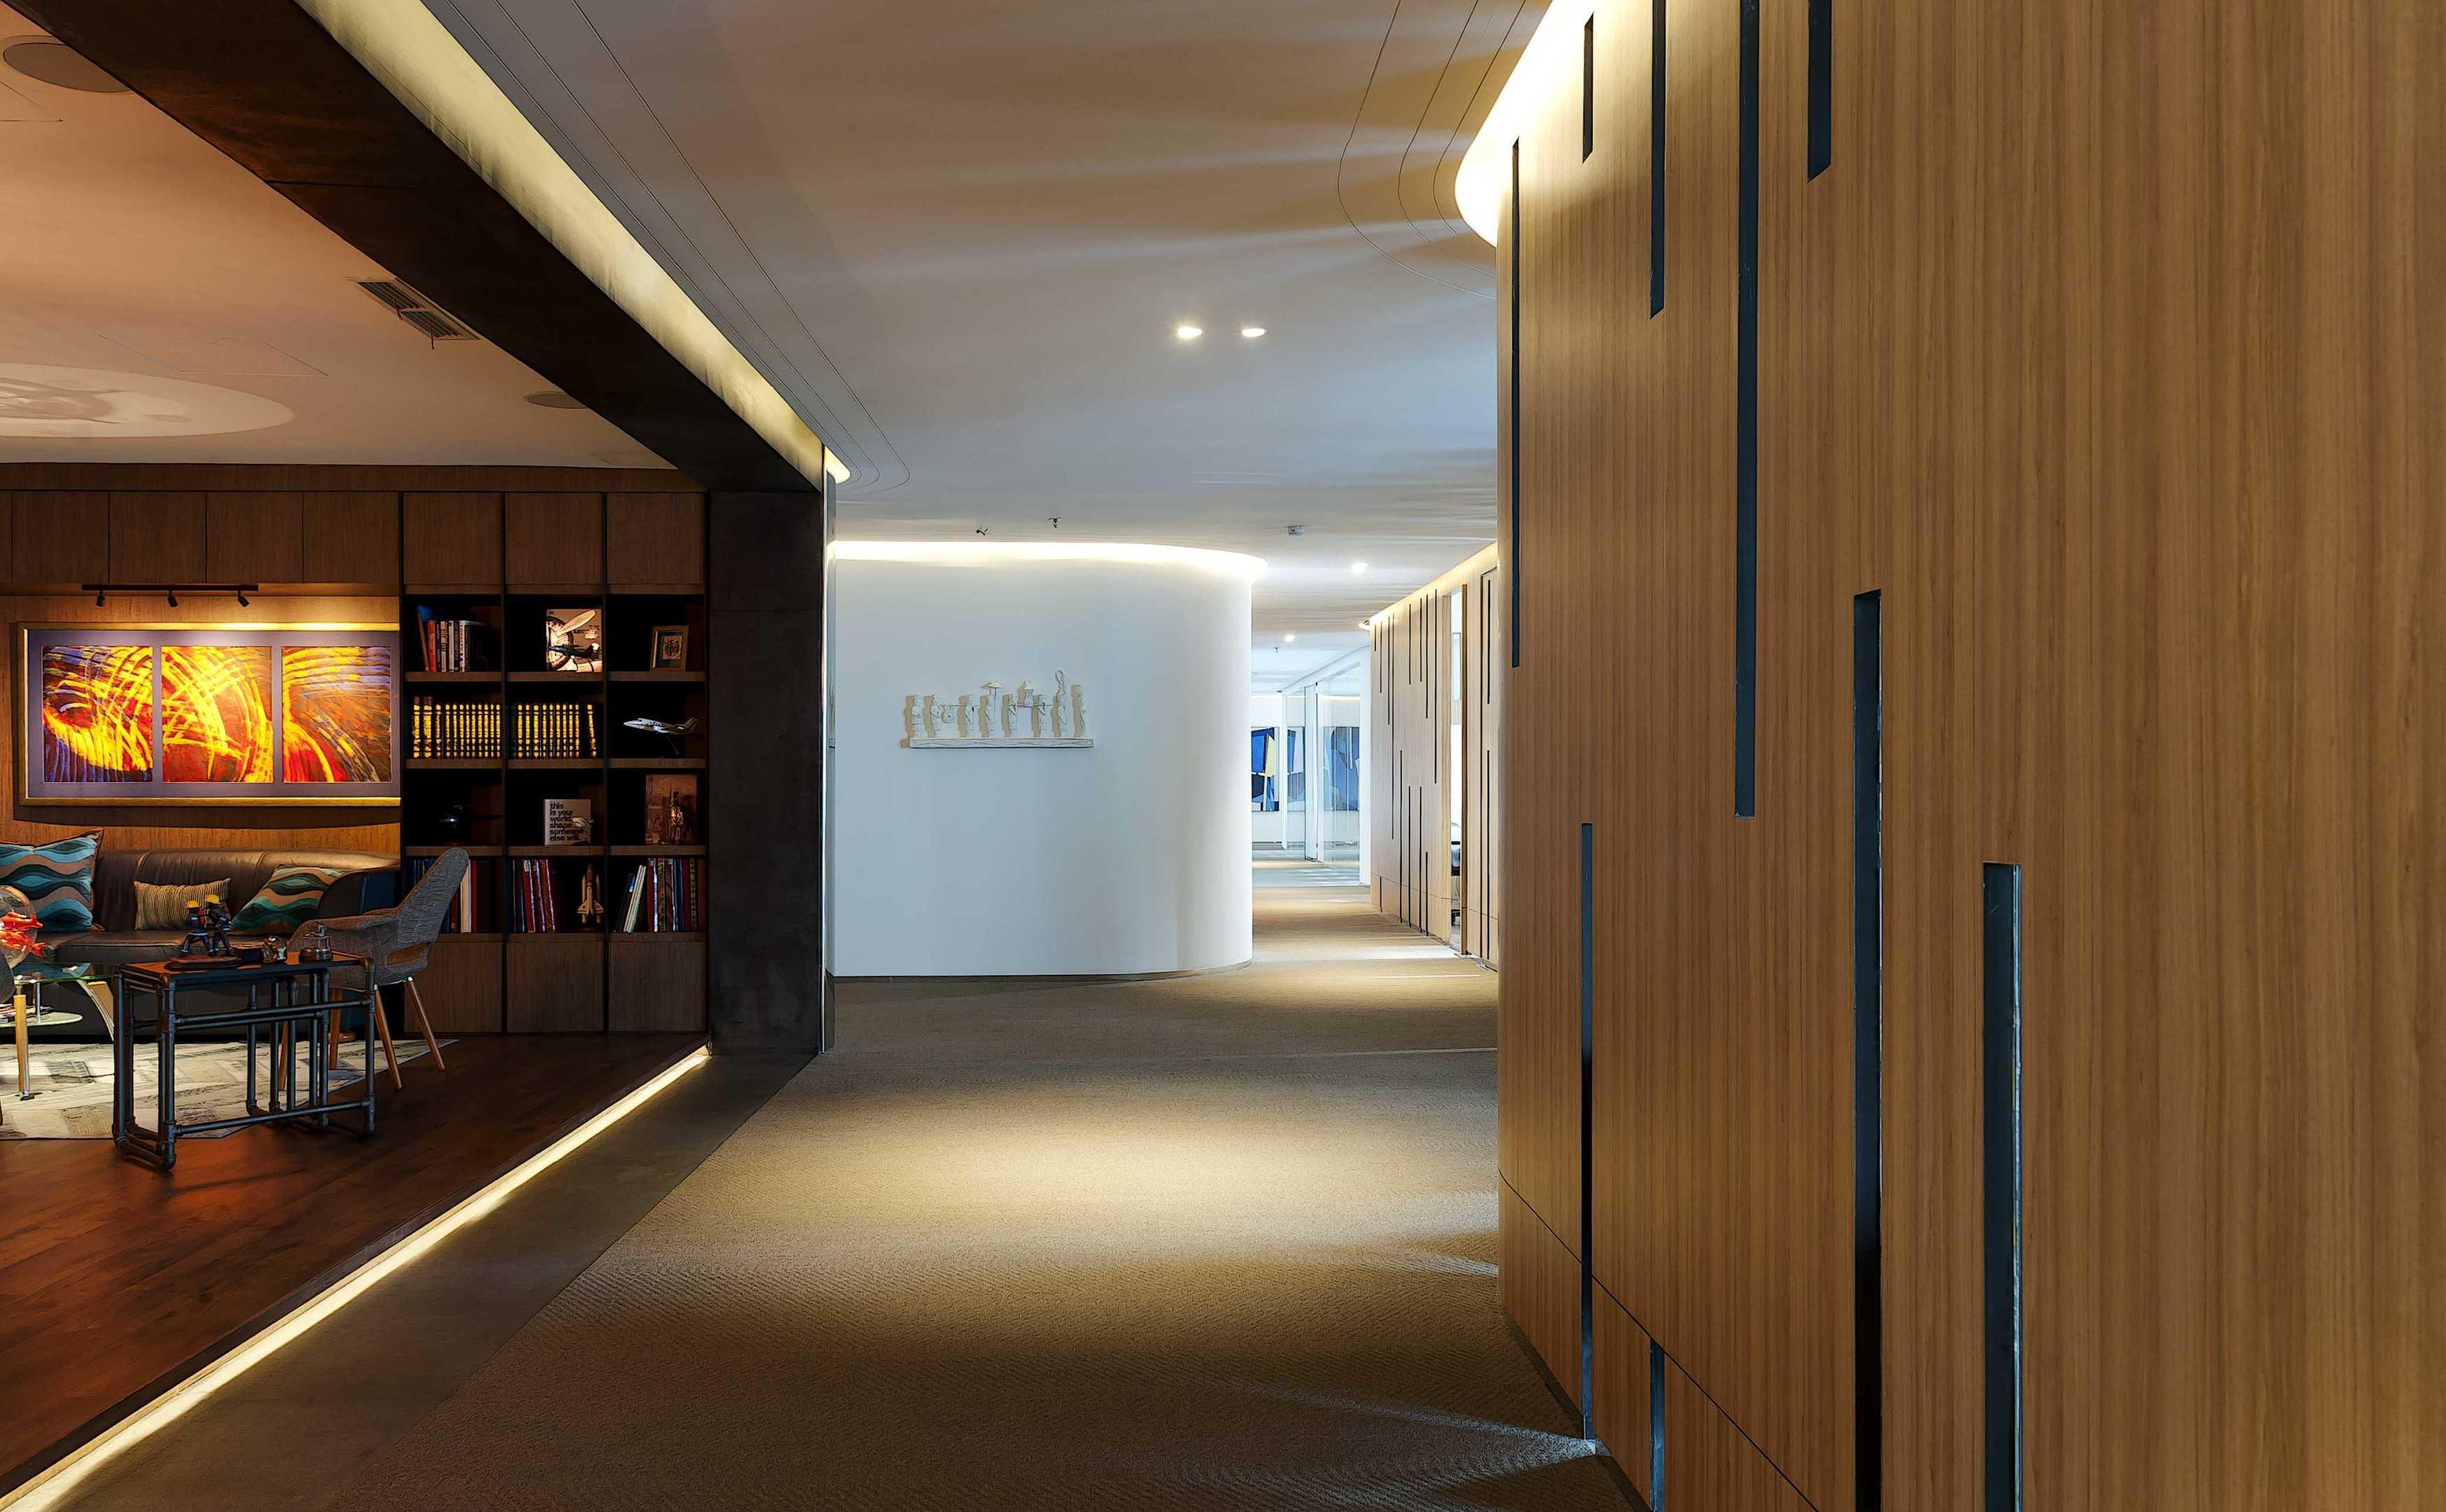 Mint-Ds Ciu Office Jakarta, Indonesia Jakarta, Indonesia Office Corridor   16154